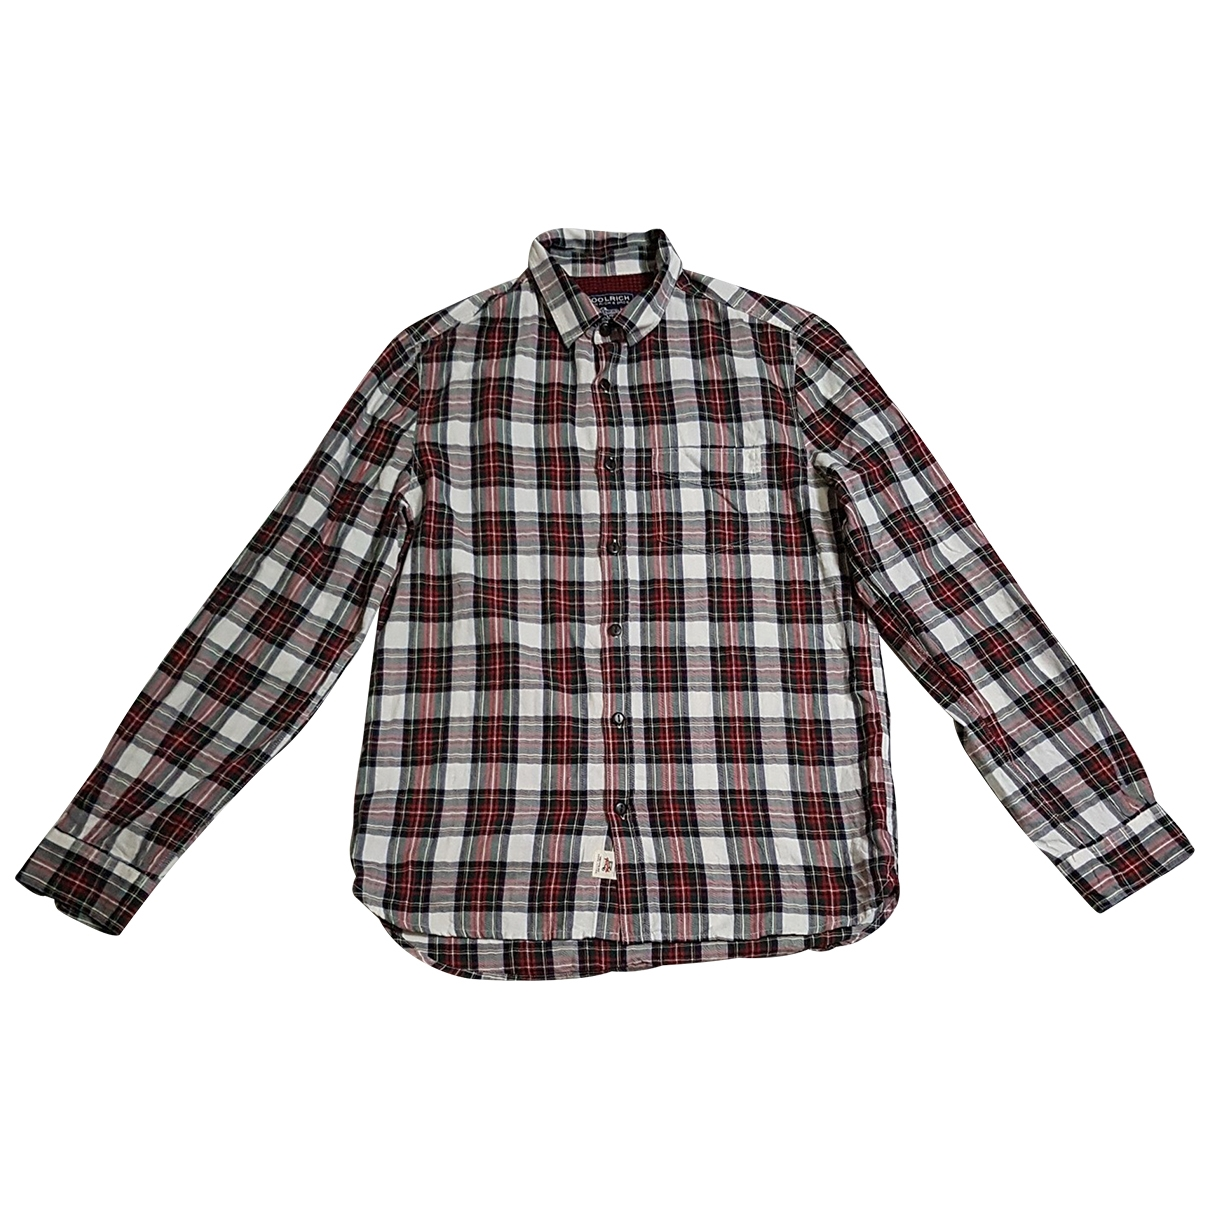 Woolrich \N Multicolour Cotton Shirts for Men M International